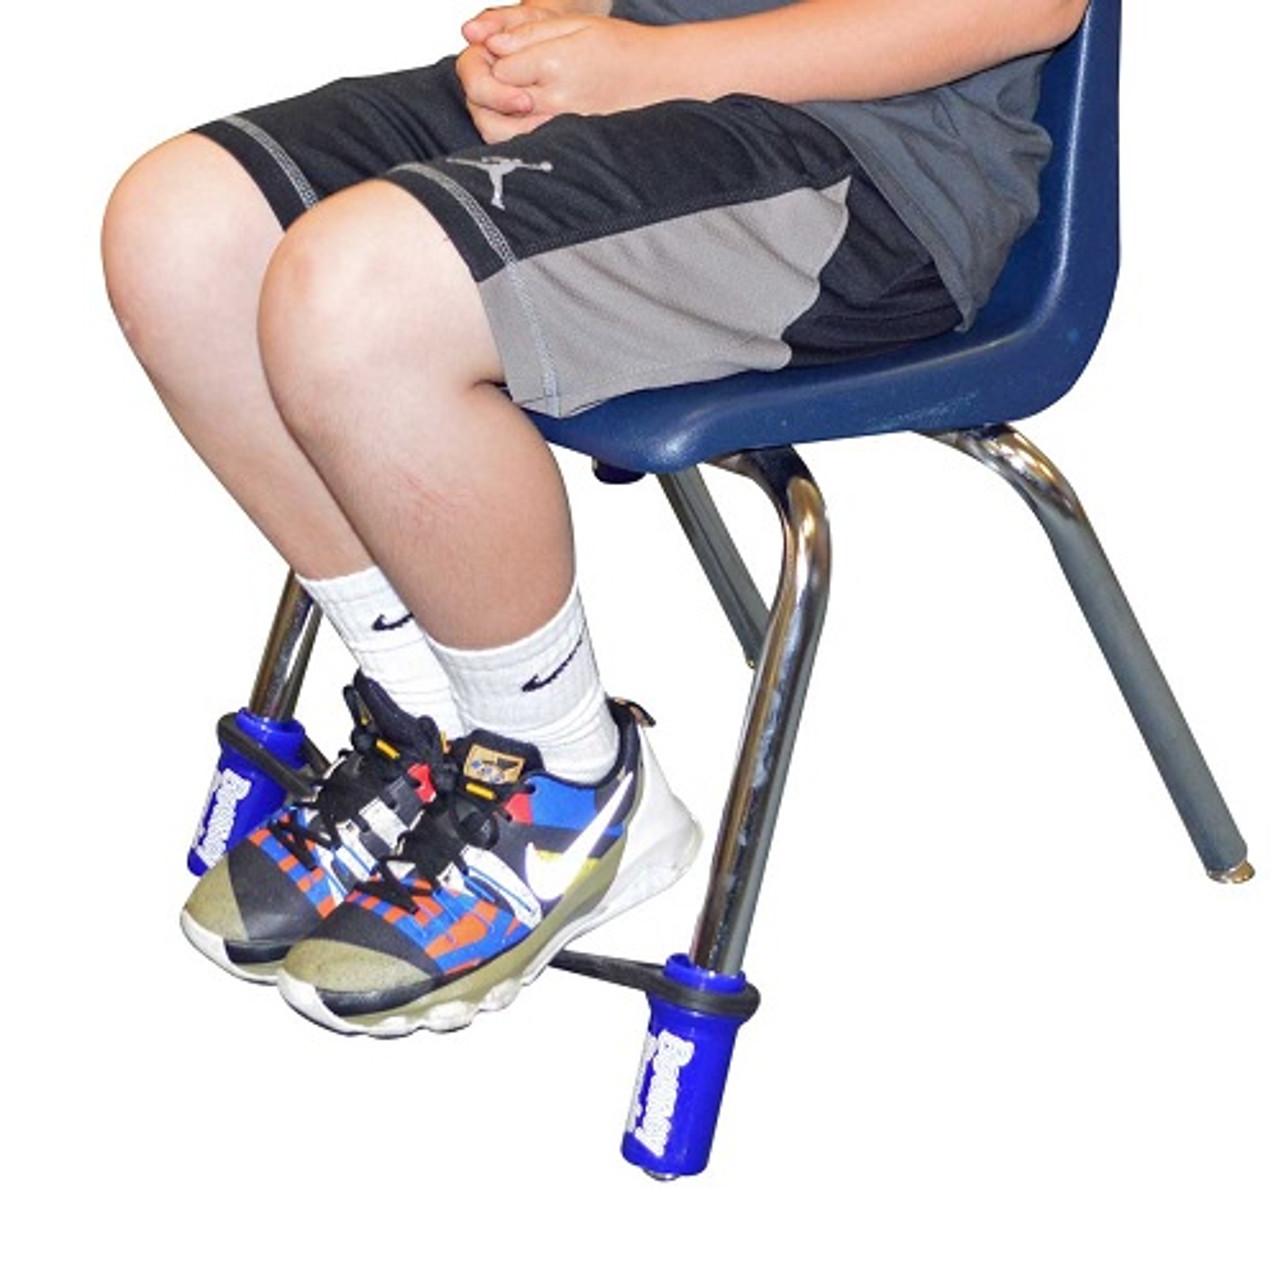 Pleasing Improves Focus For School Kids And Class Kick Bands Short Links Chair Design For Home Short Linksinfo